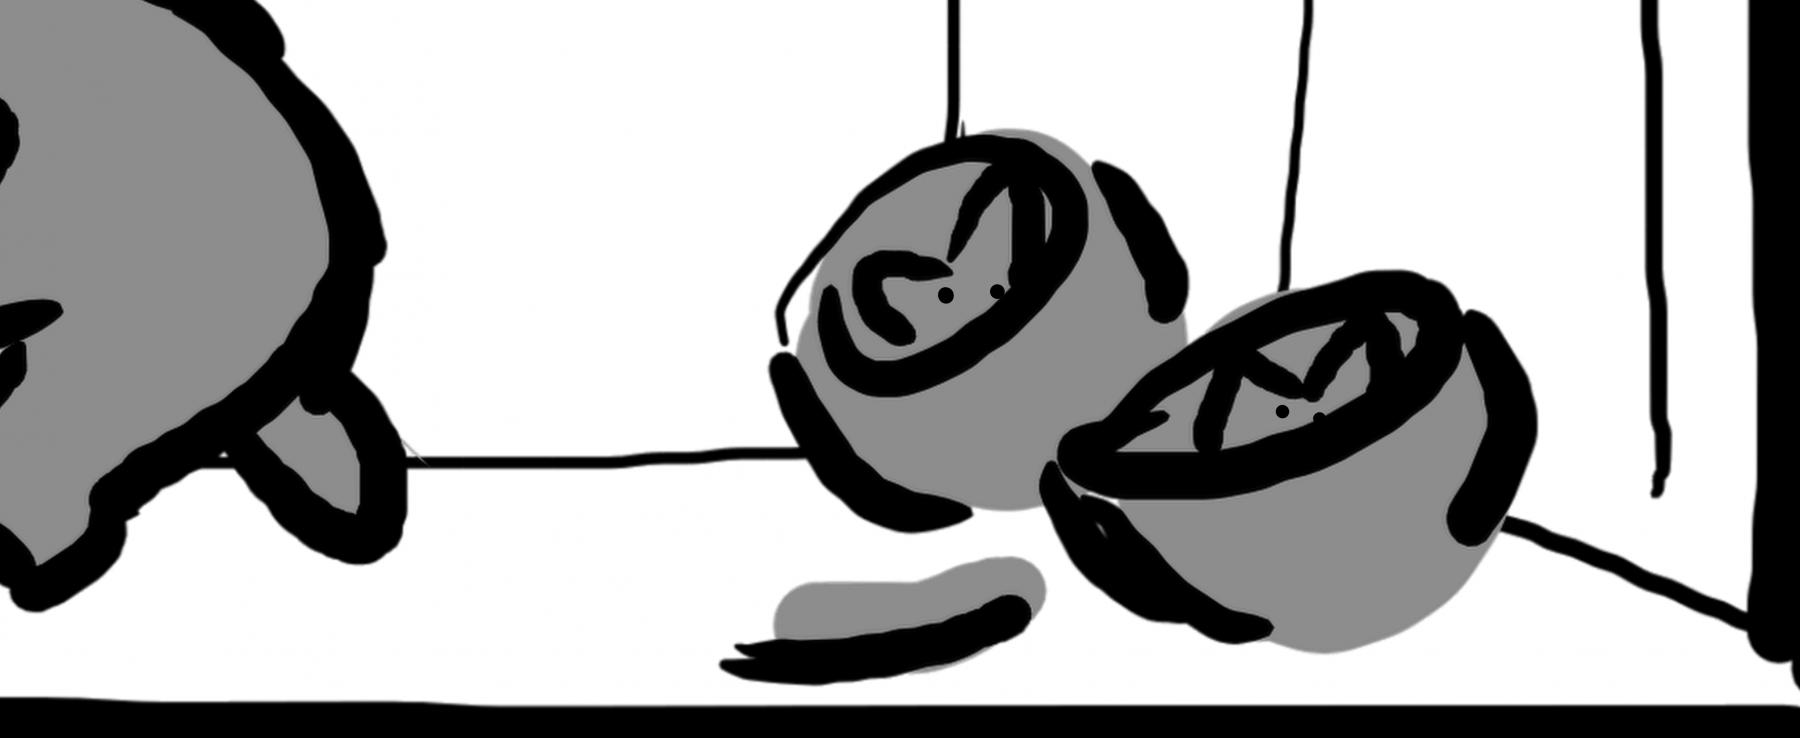 Nut-Thumbnail-Rough-Board00387